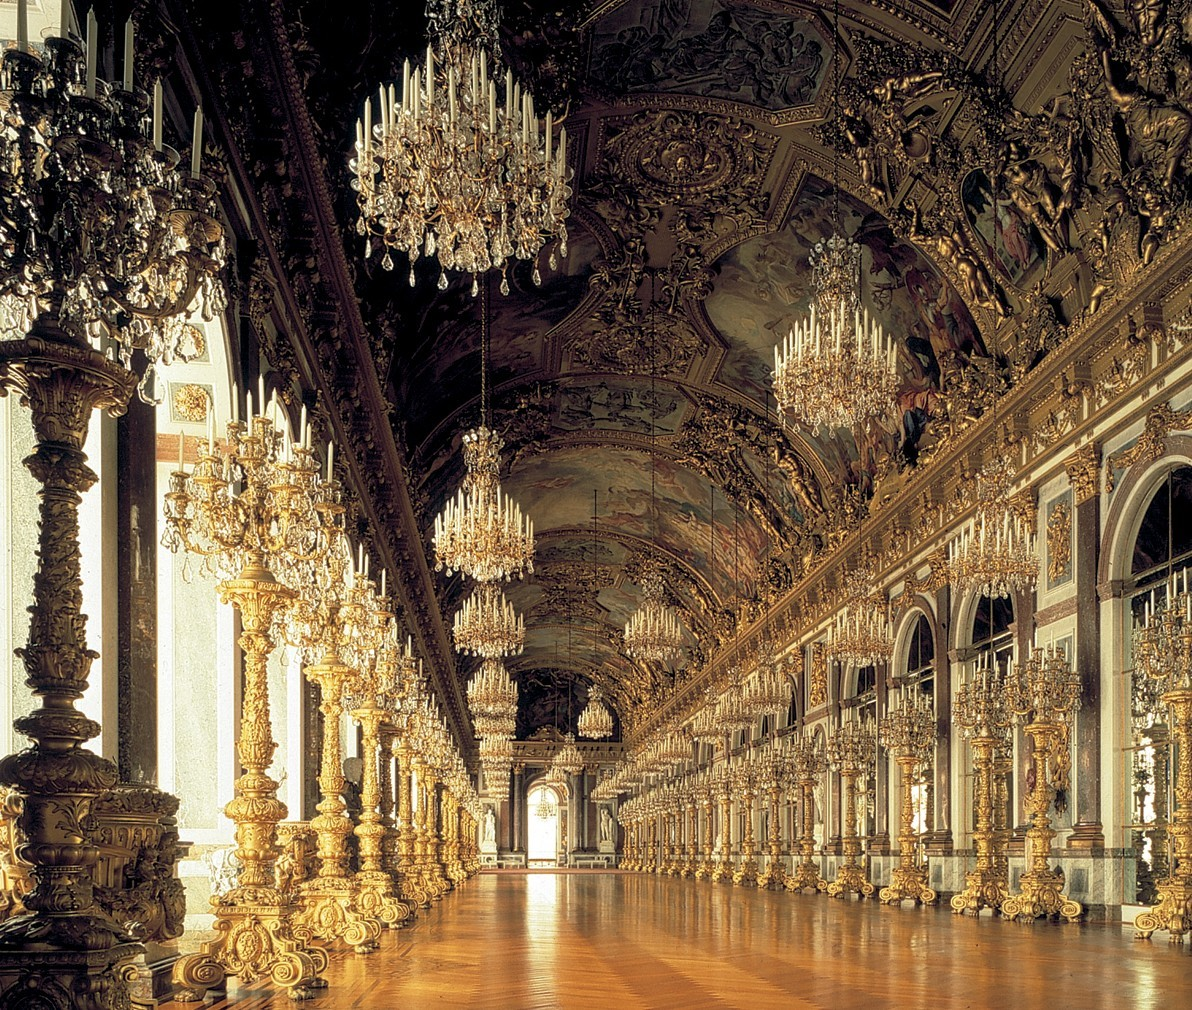 Répliques de Versailles Tumblr_mlekl618Wz1rk3hpbo1_1280